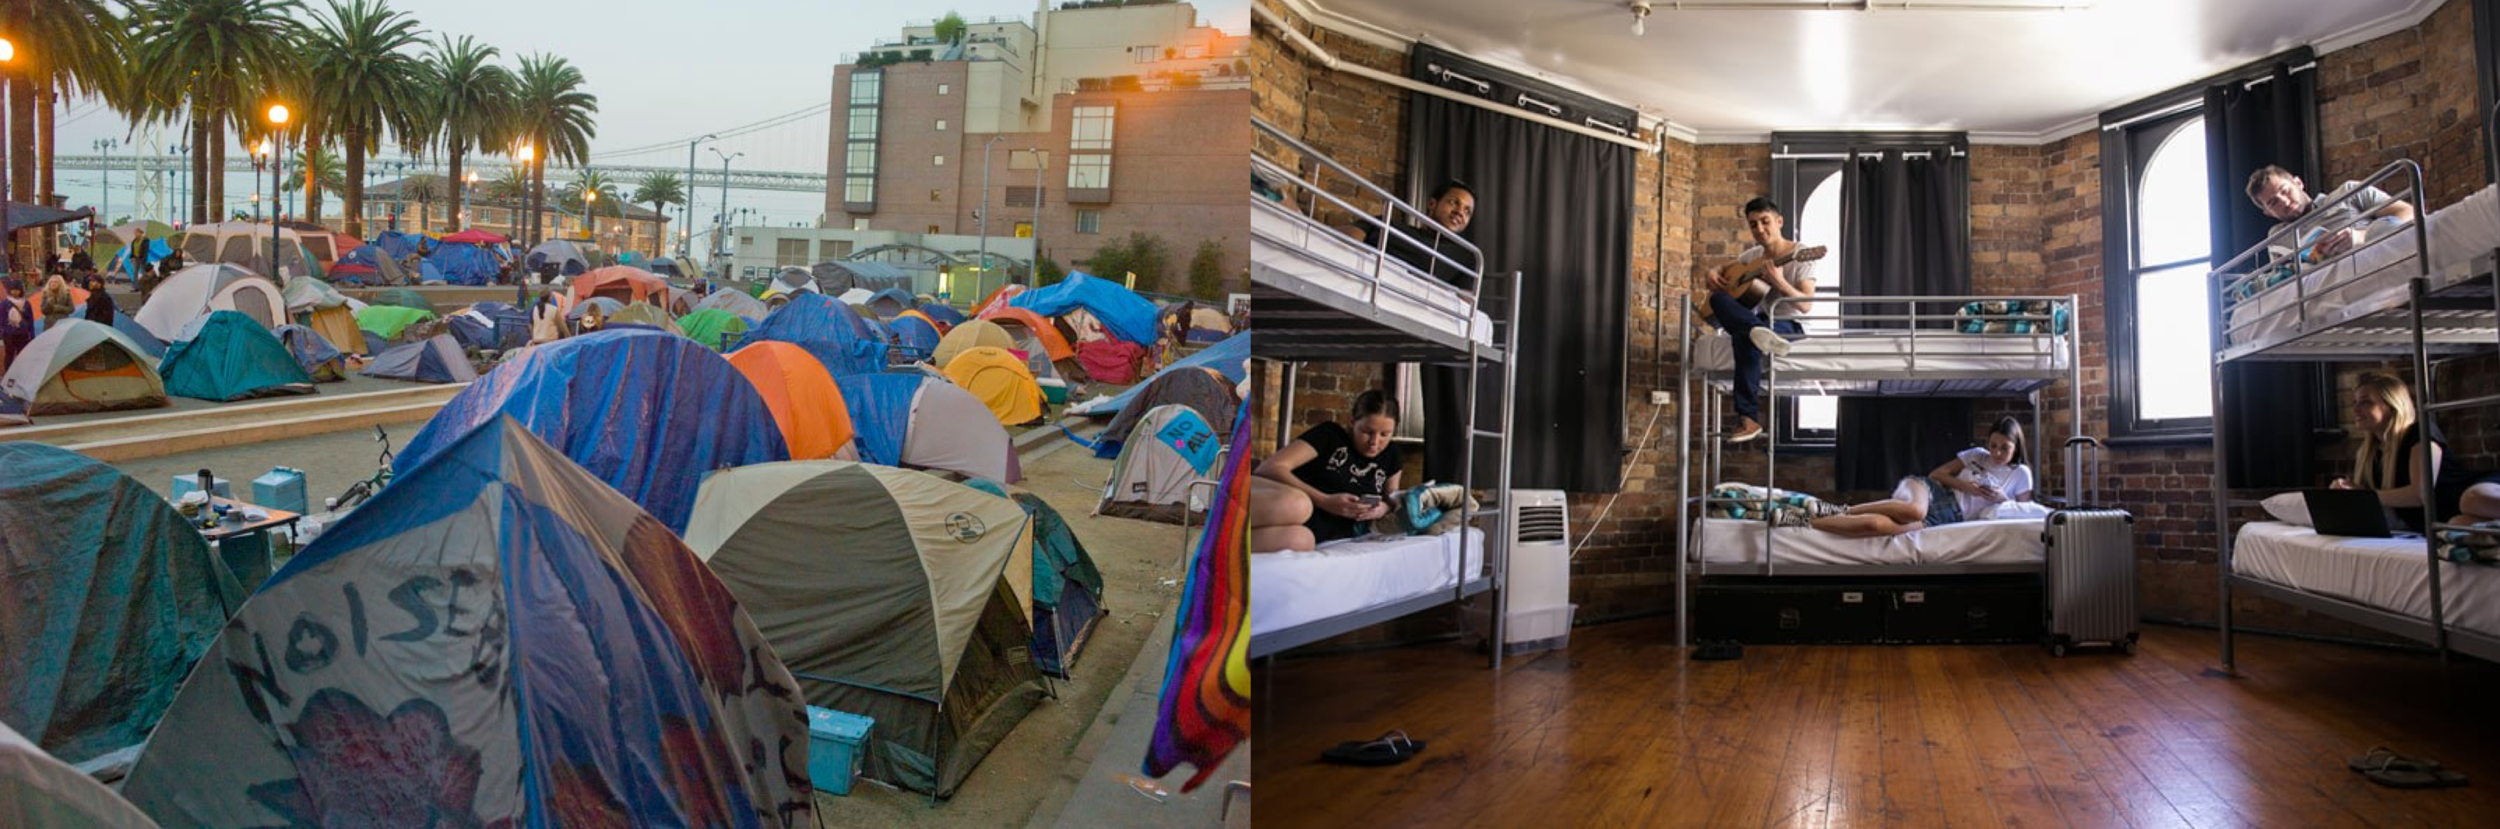 Homeless Encampment in San Francisco, Backpacker Hostel in Brisbane